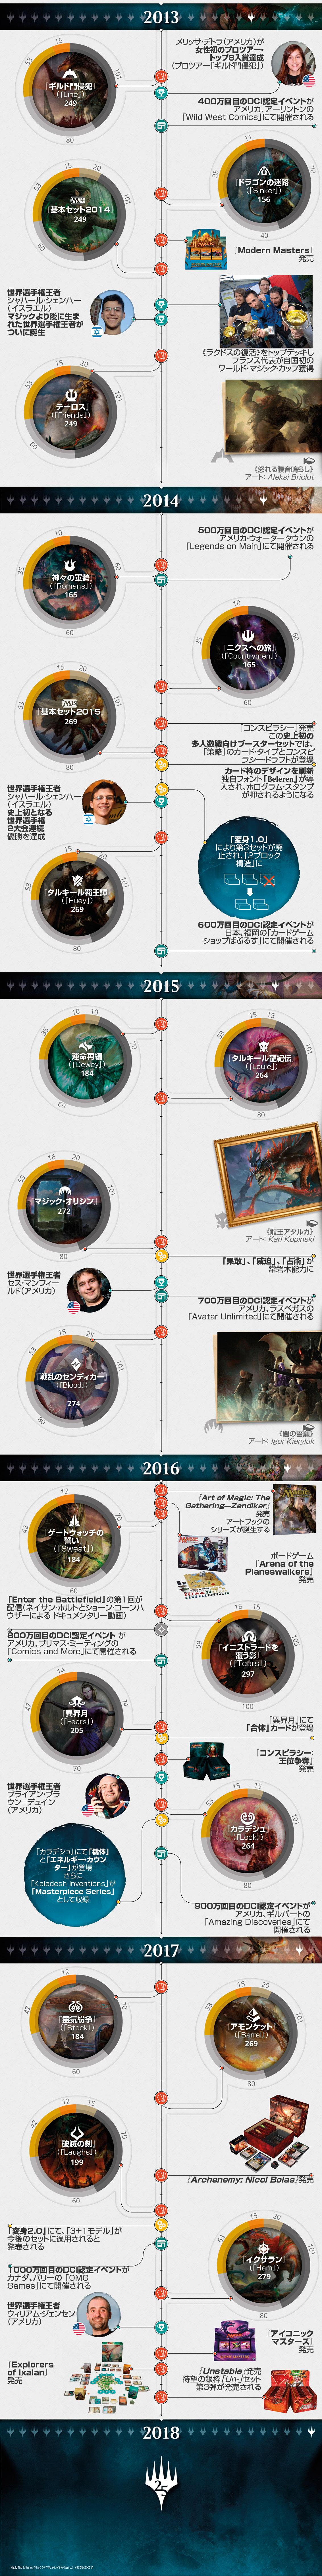 25 Year Timeline Part 3